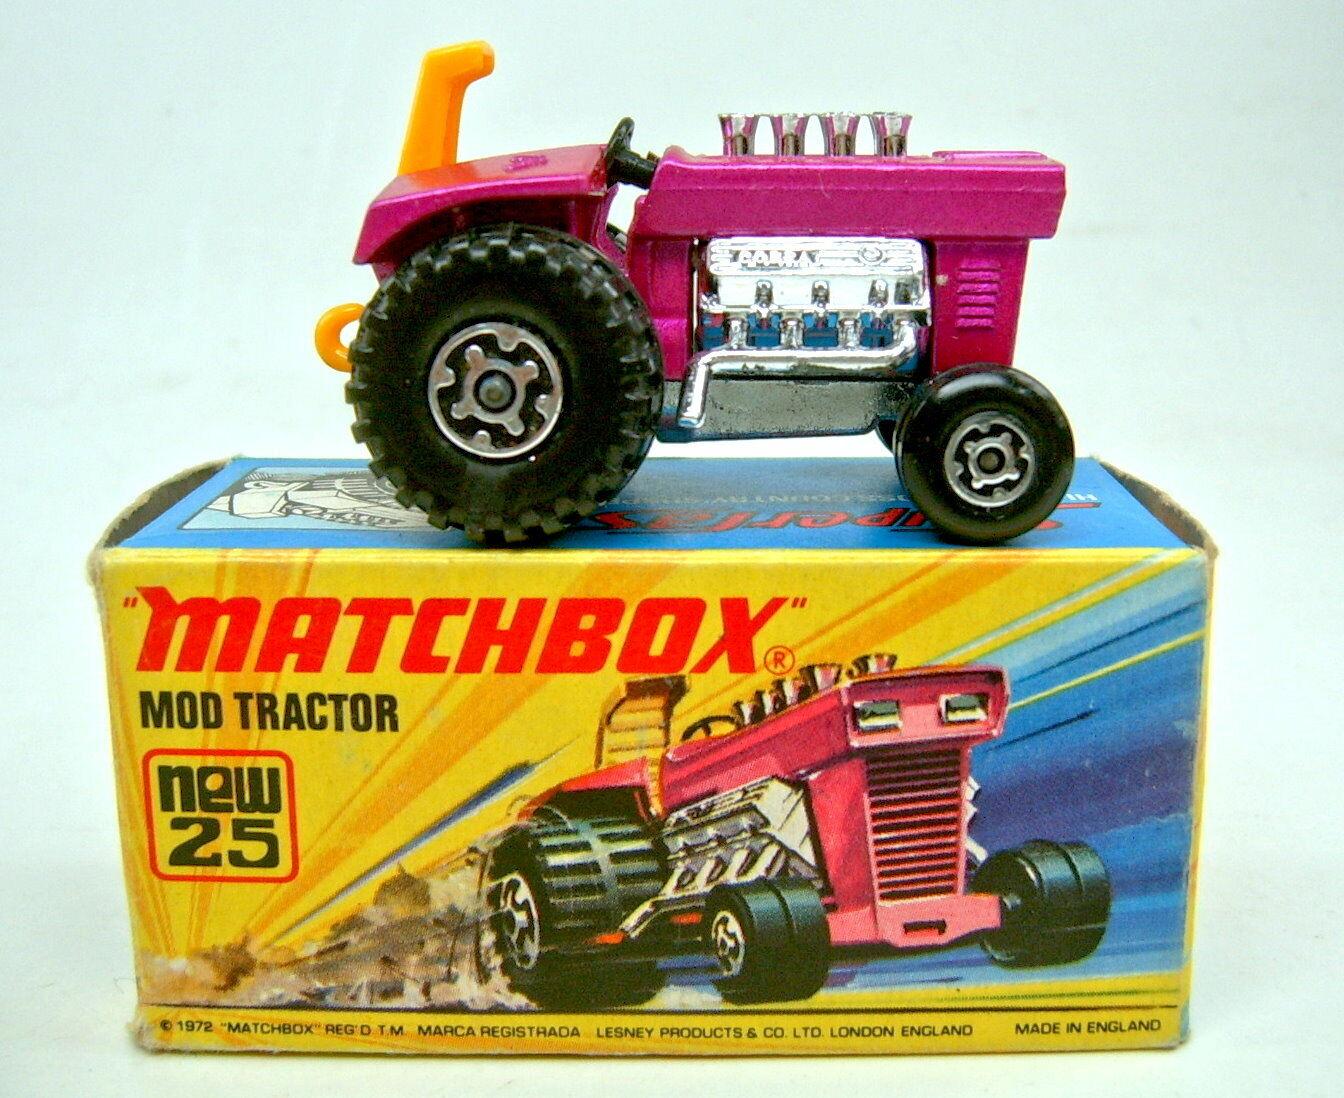 MATCHBOX SUPERFAST Nº 25b MOD TRACTOR Violet peinte plaque de sol Top Dans Box